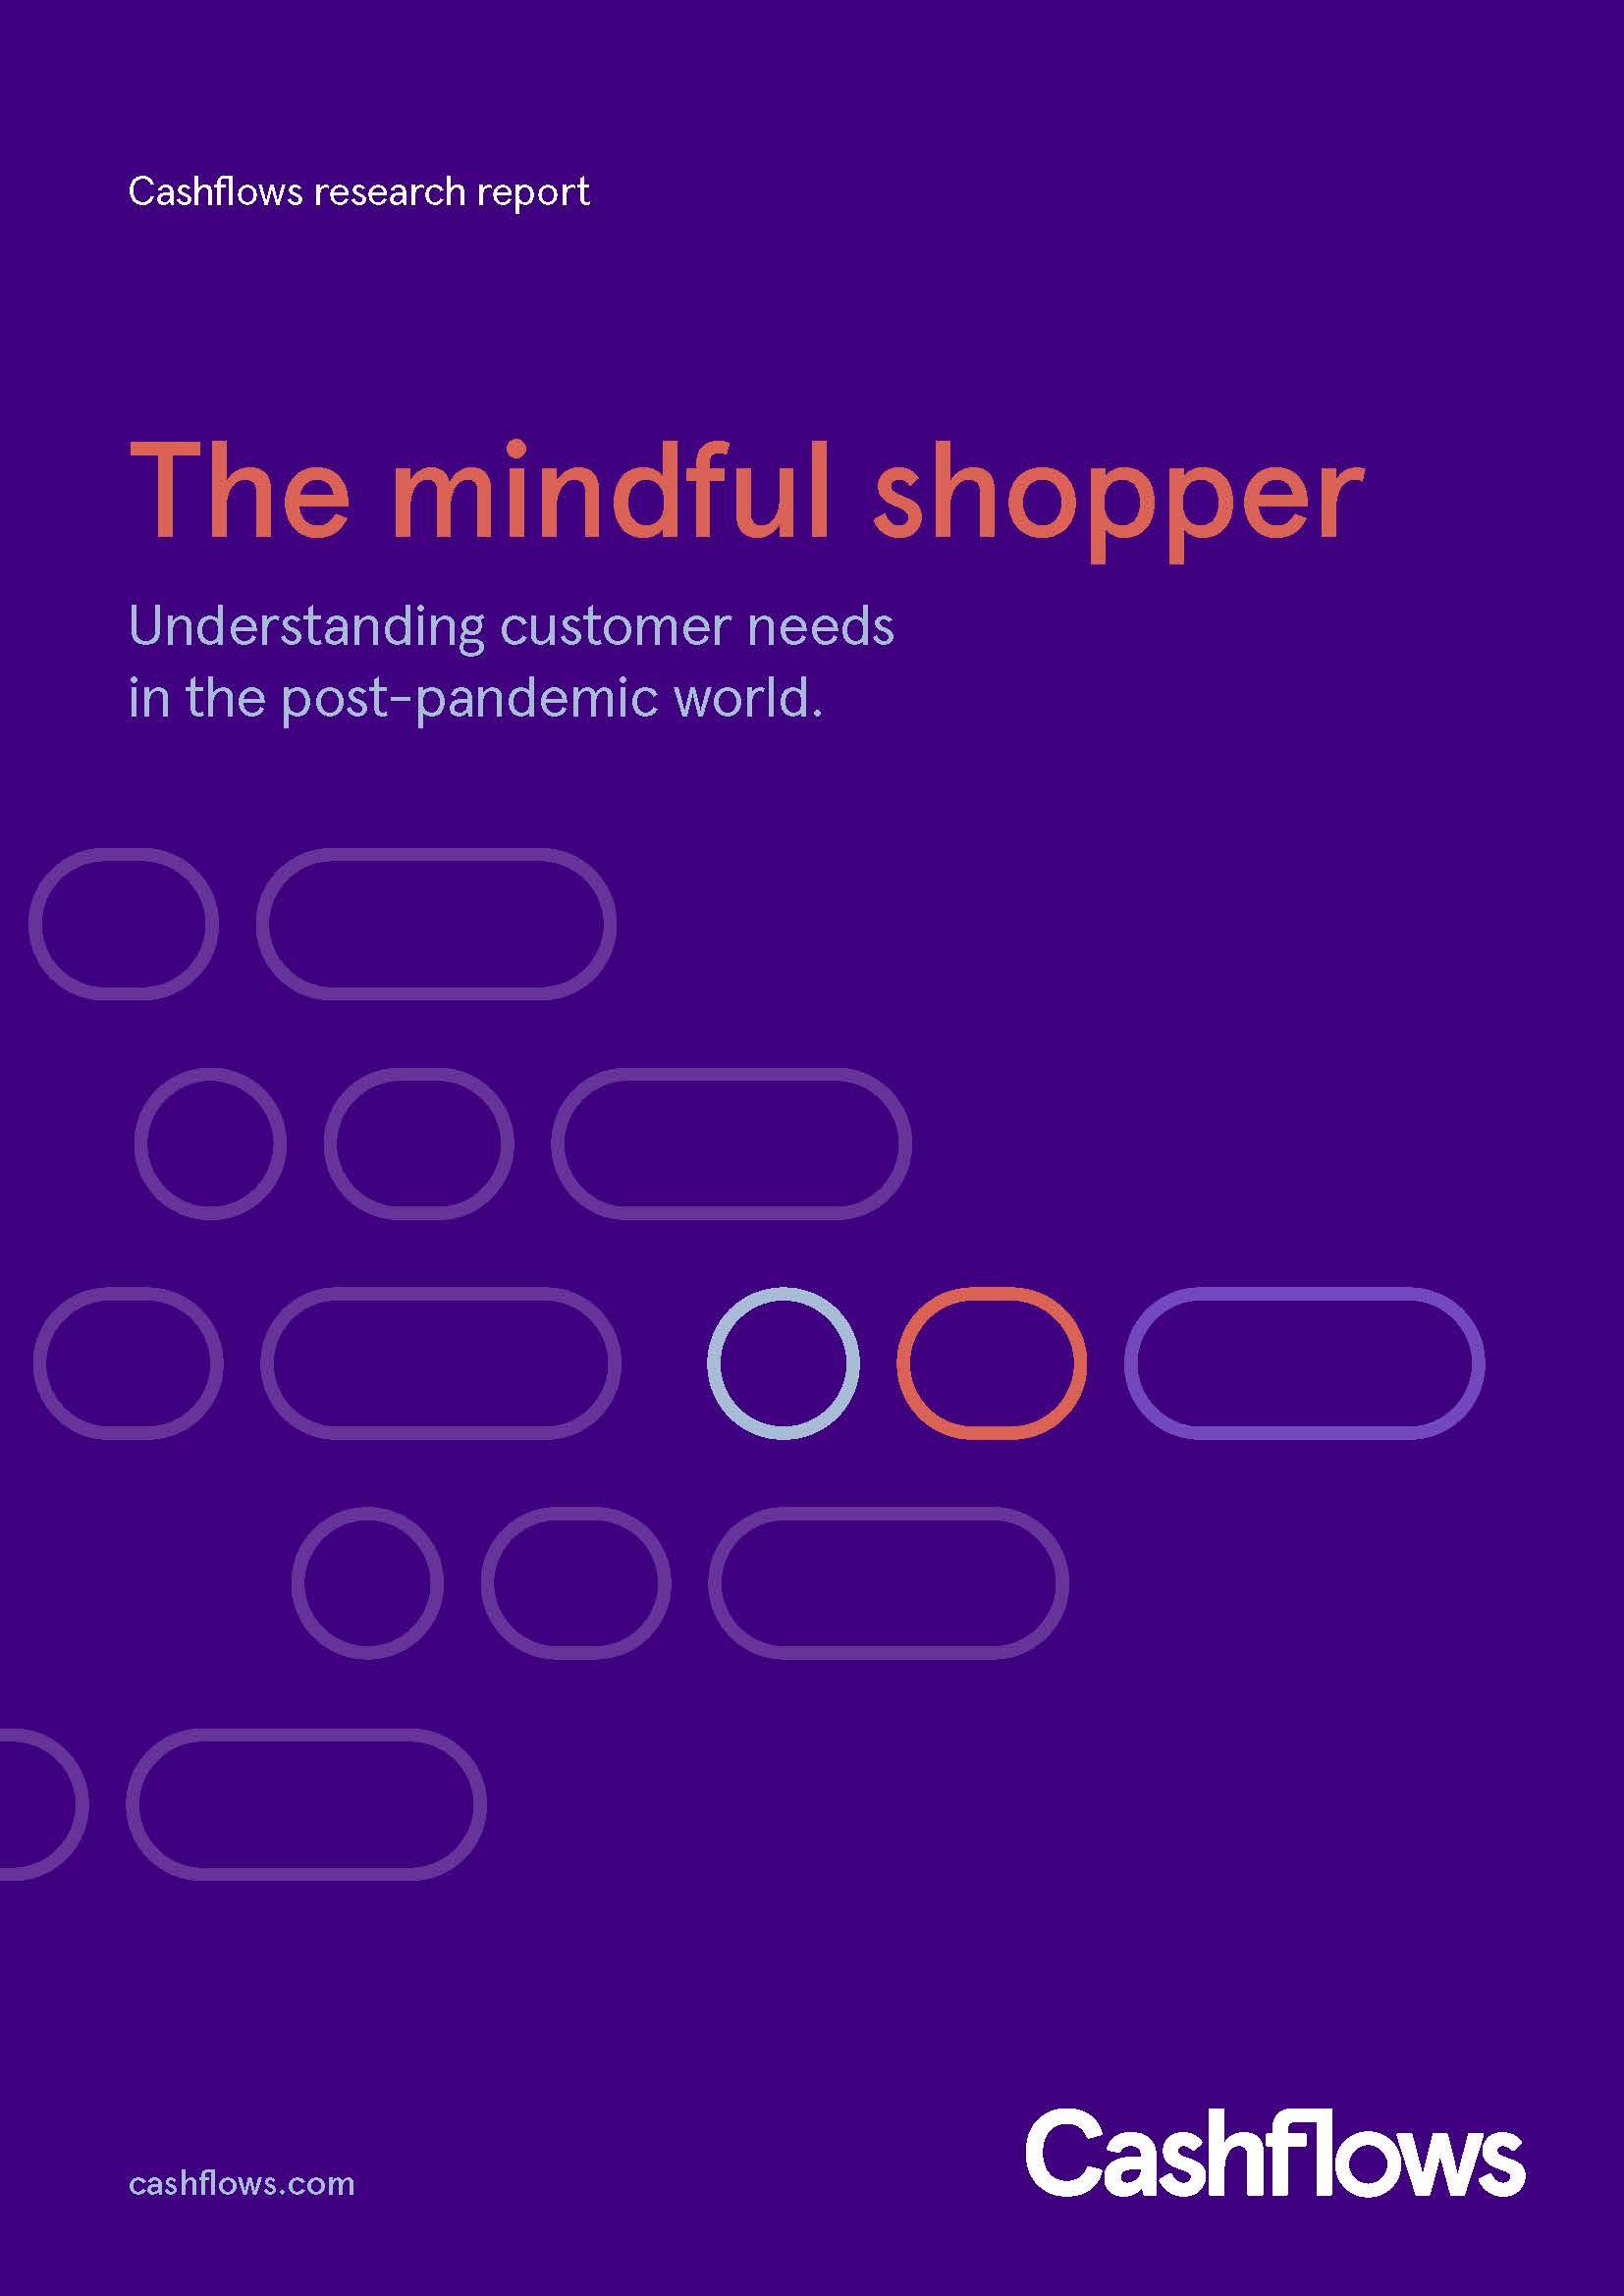 4123__Cashflows Mindful Shopper whitepaper_A4_RGB_V2_feedback_Page_01